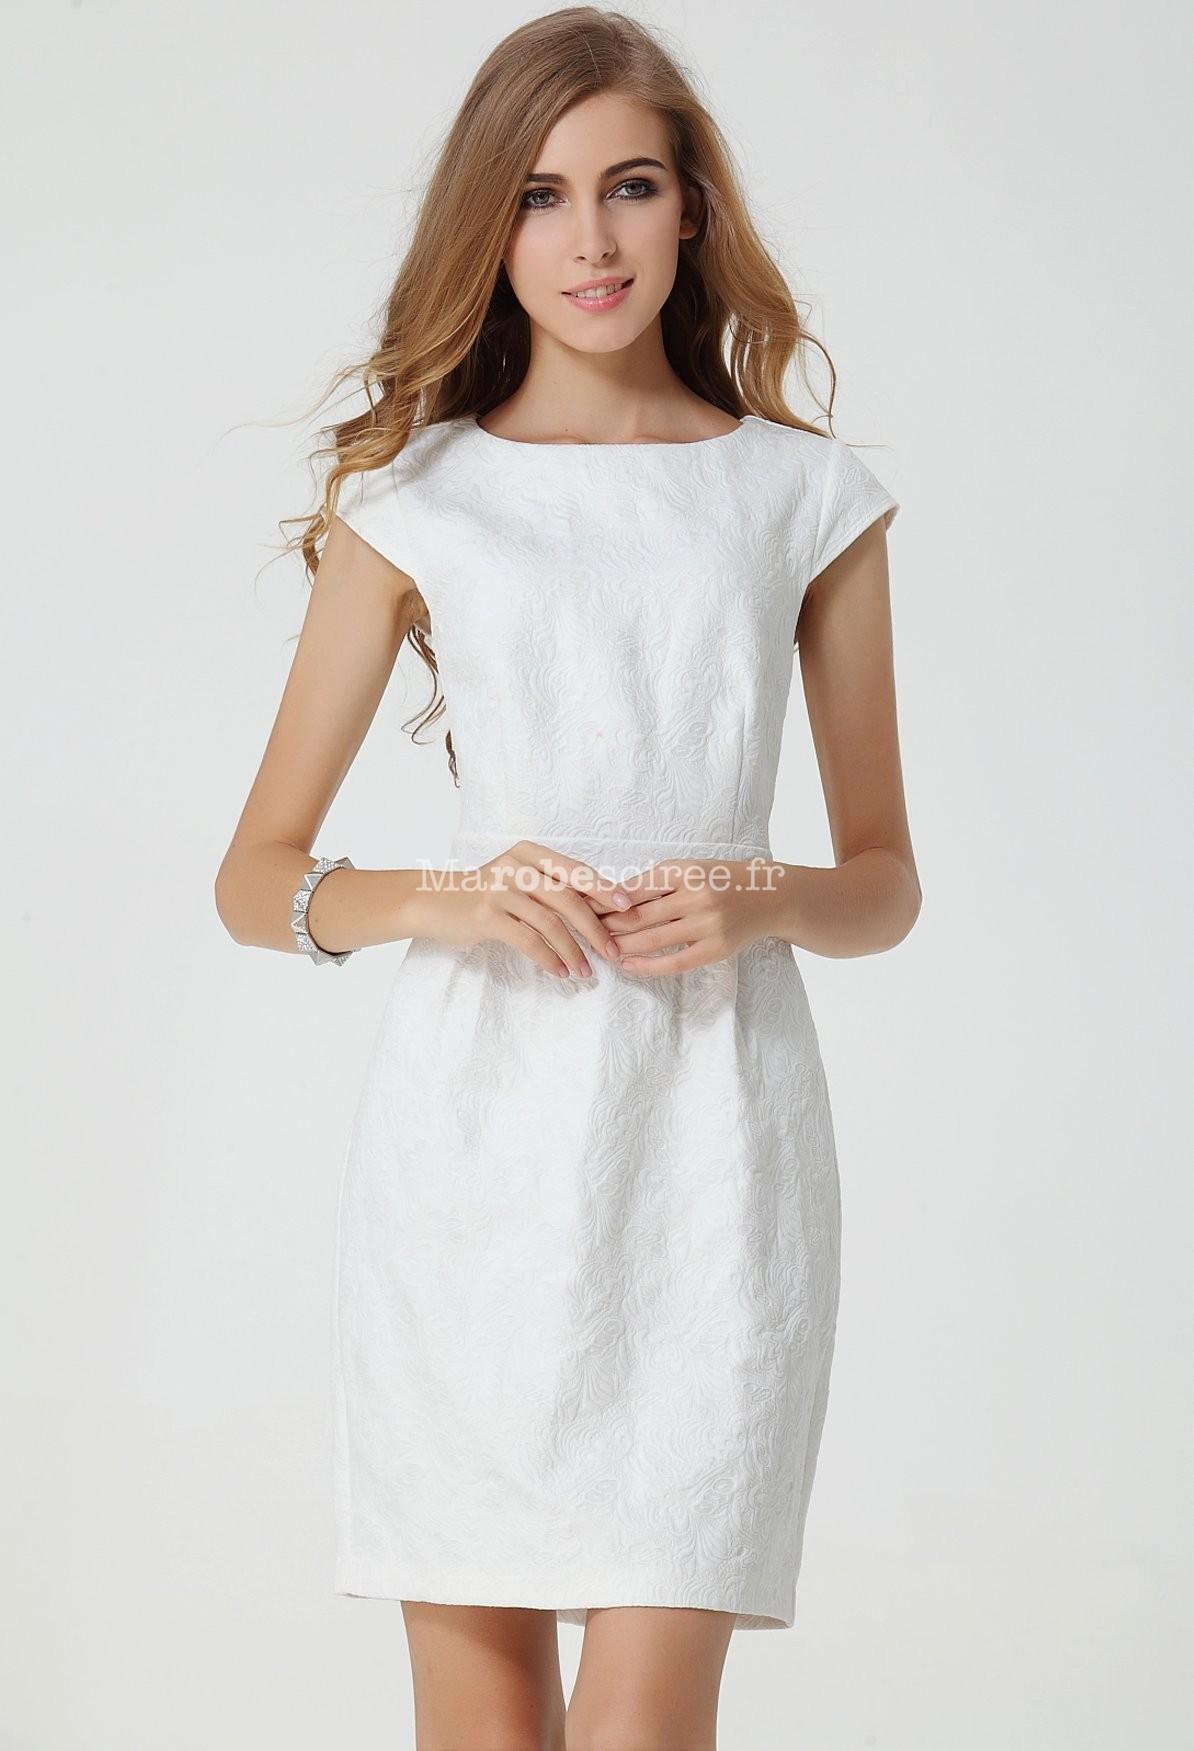 robe fourreau blanche courte droite. Black Bedroom Furniture Sets. Home Design Ideas